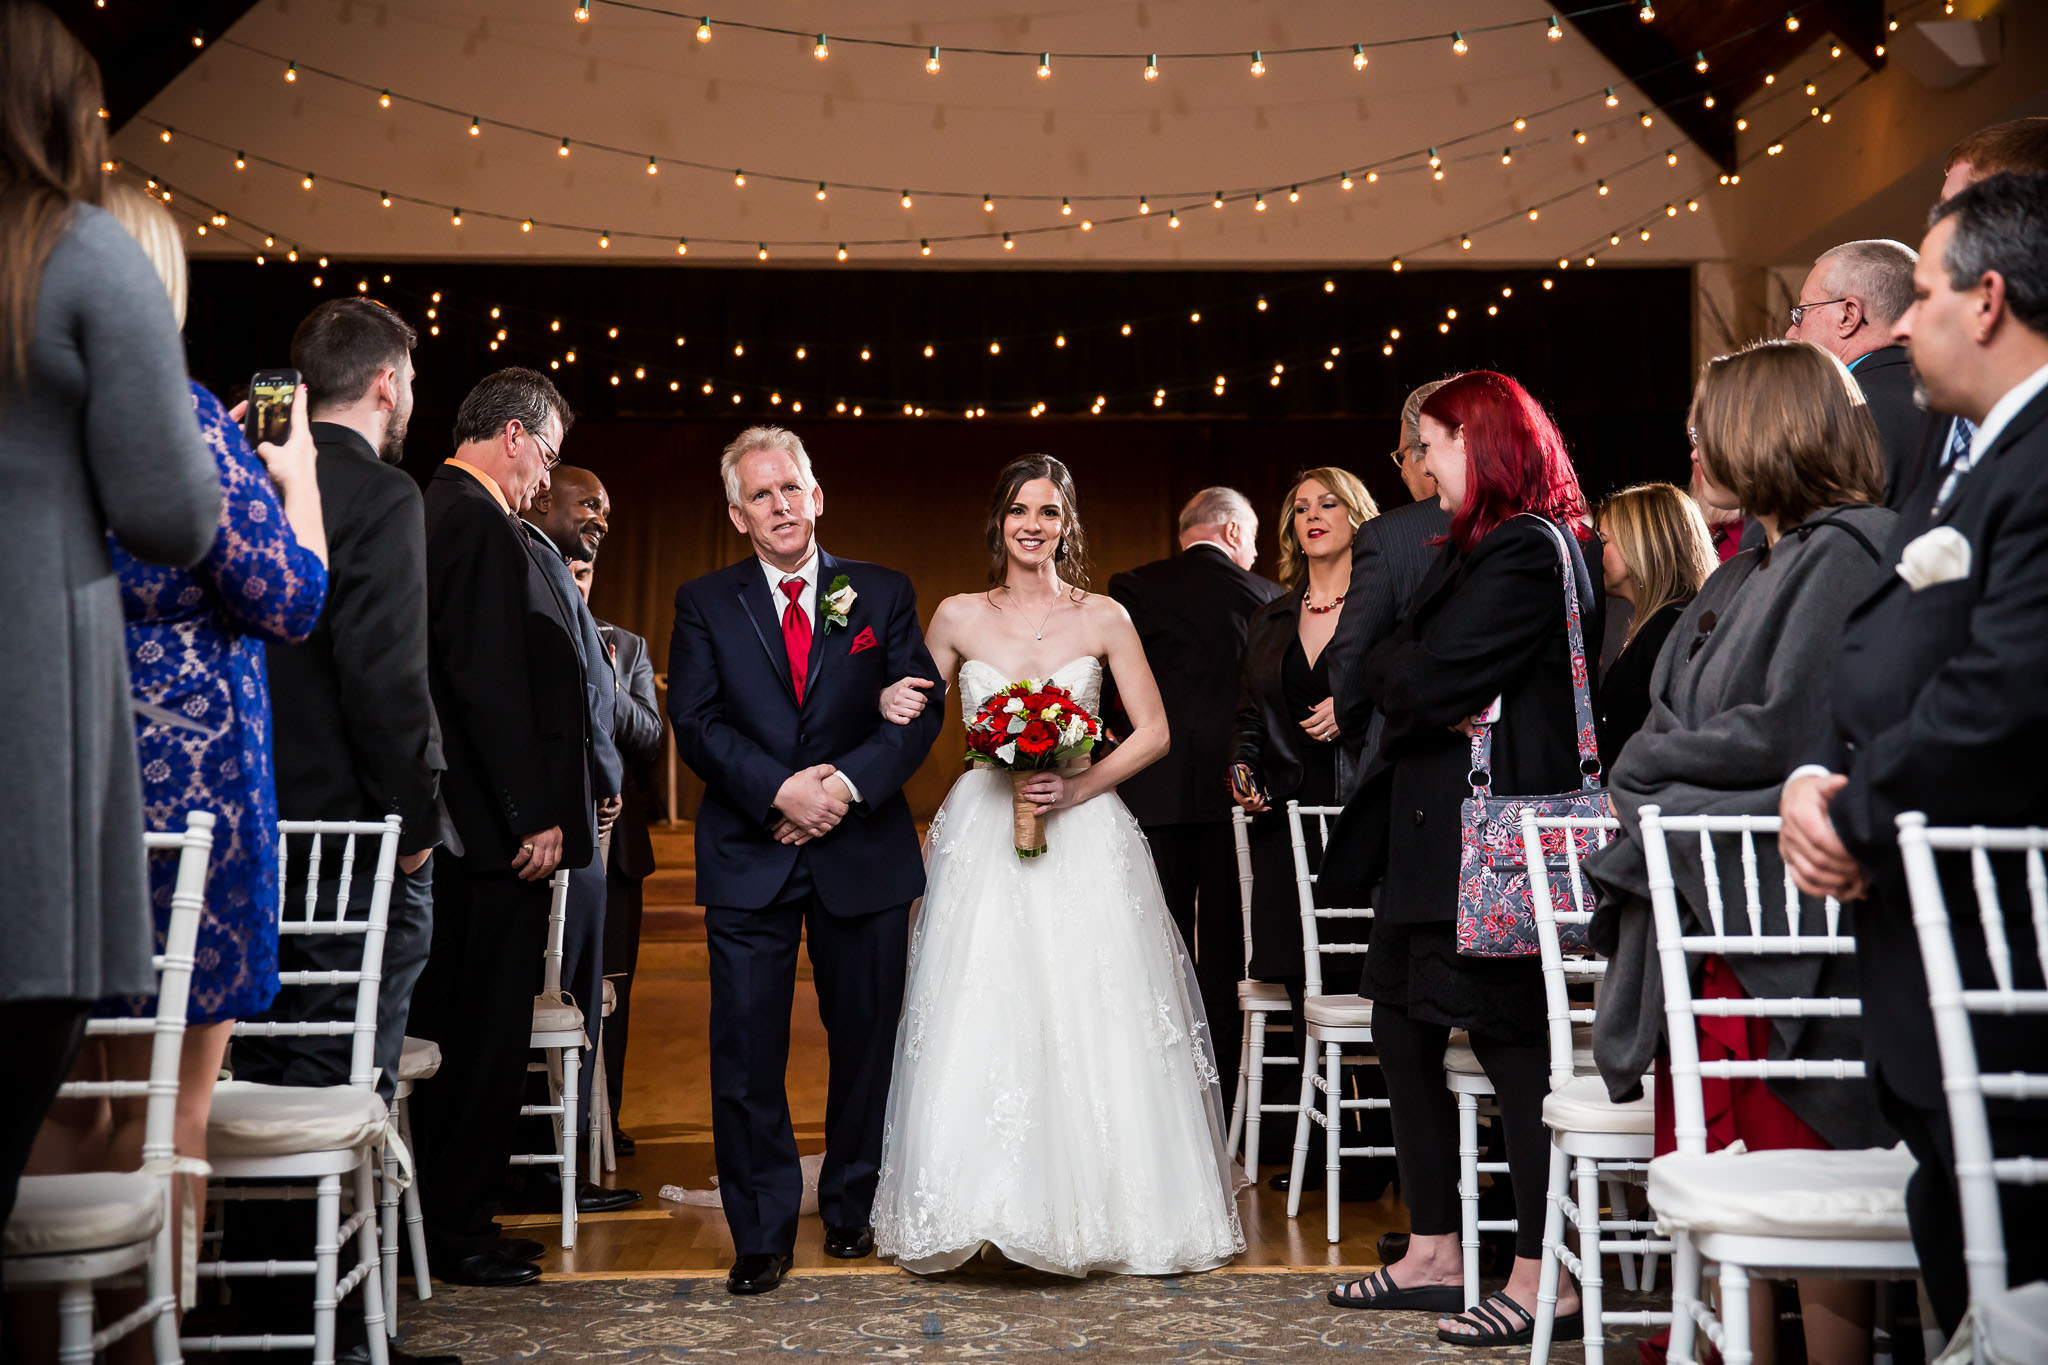 2016-12-10 - Grosso-Stock Wedding-0013.jpg